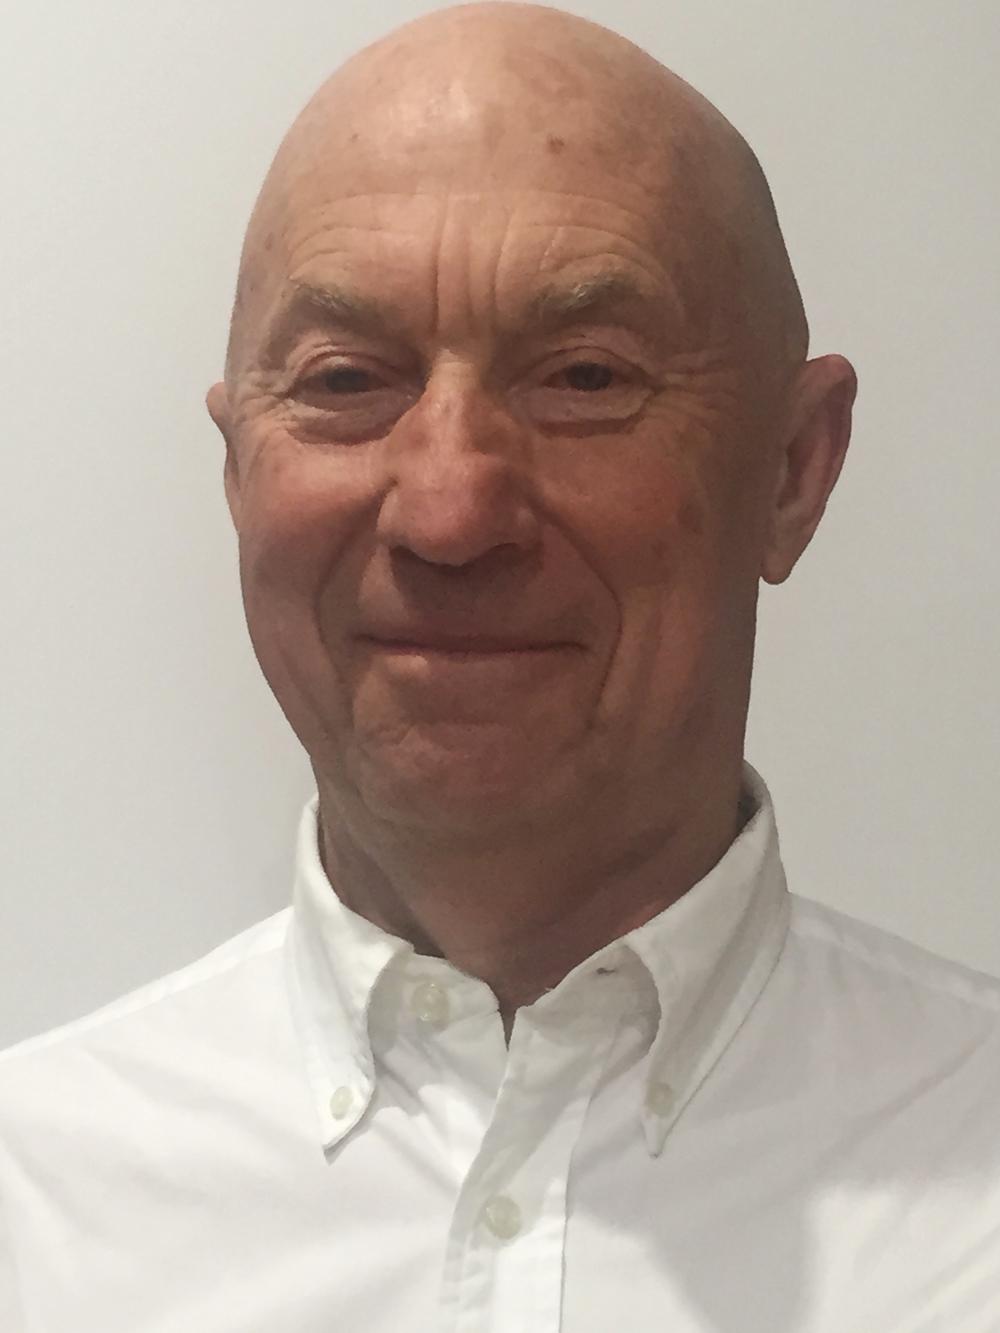 Eric-Dowker-Chiropractor-TMJ-Centre-Melbourne .jpg